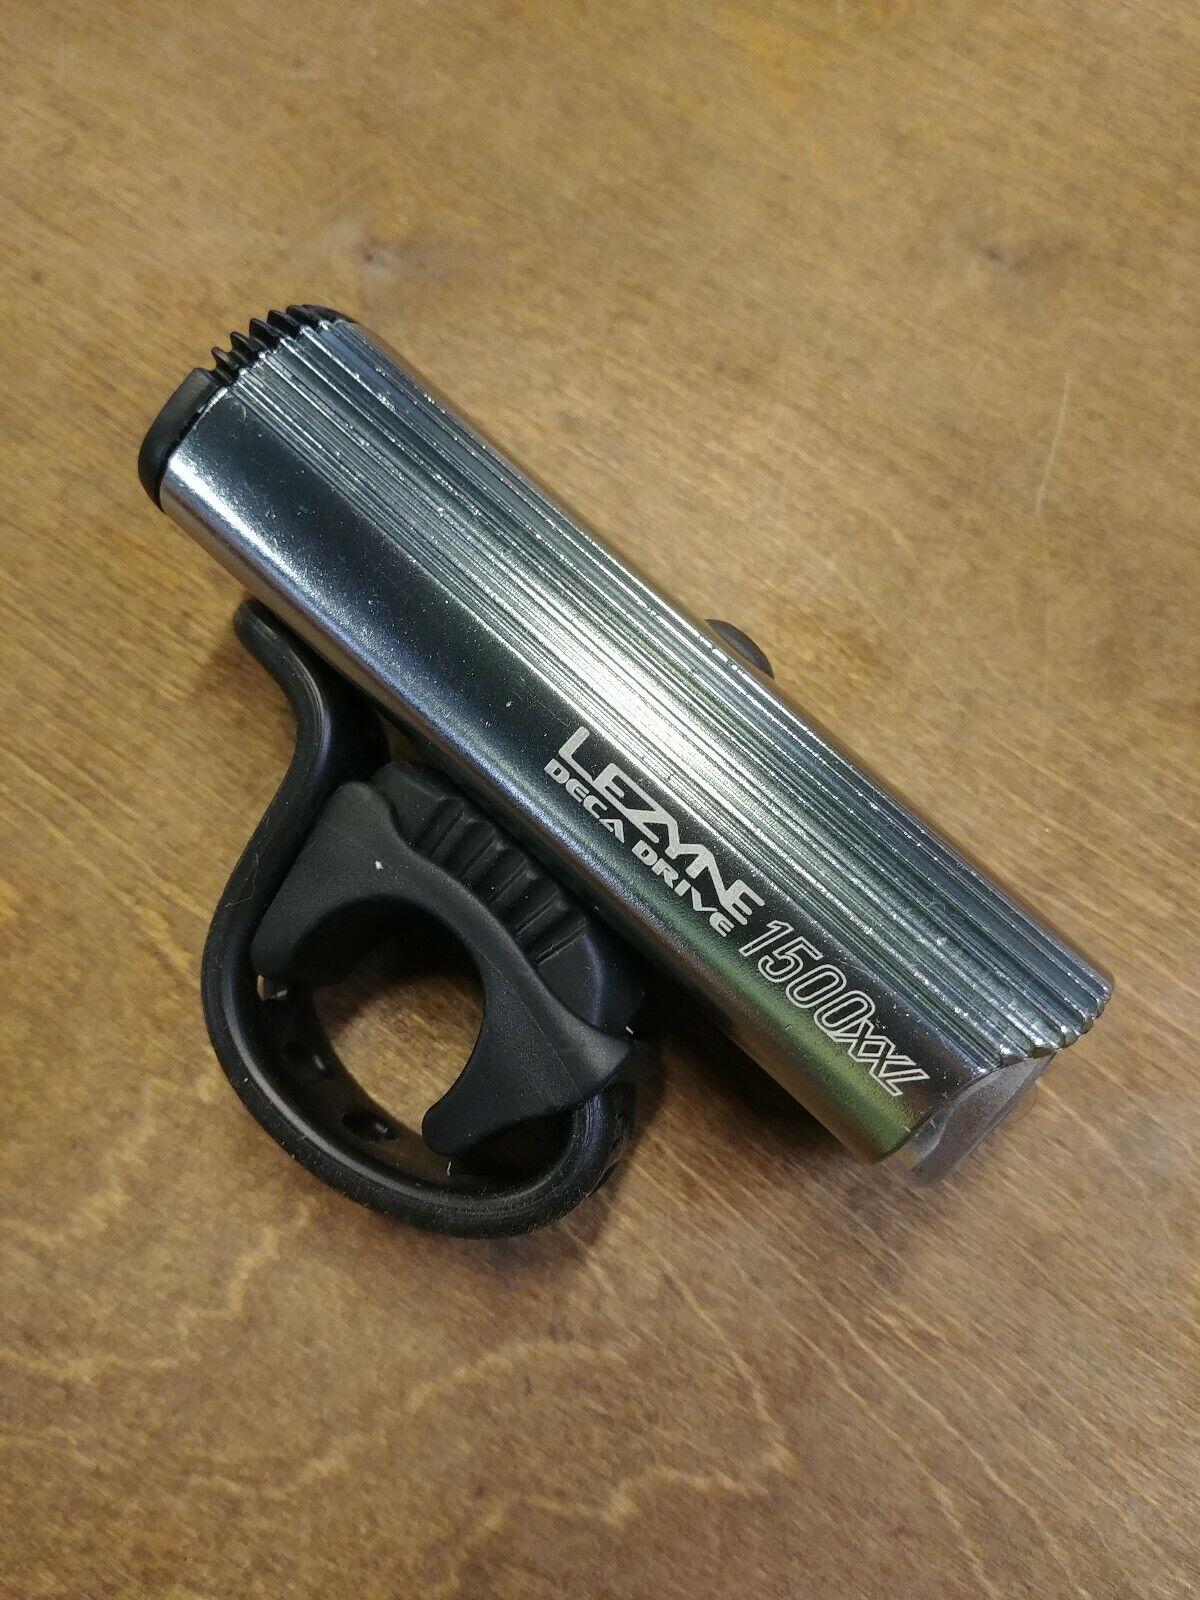 Lezyne Deca Drive 1500i Kit w// Infinite Power Pack Bicycle Headlight Light Black